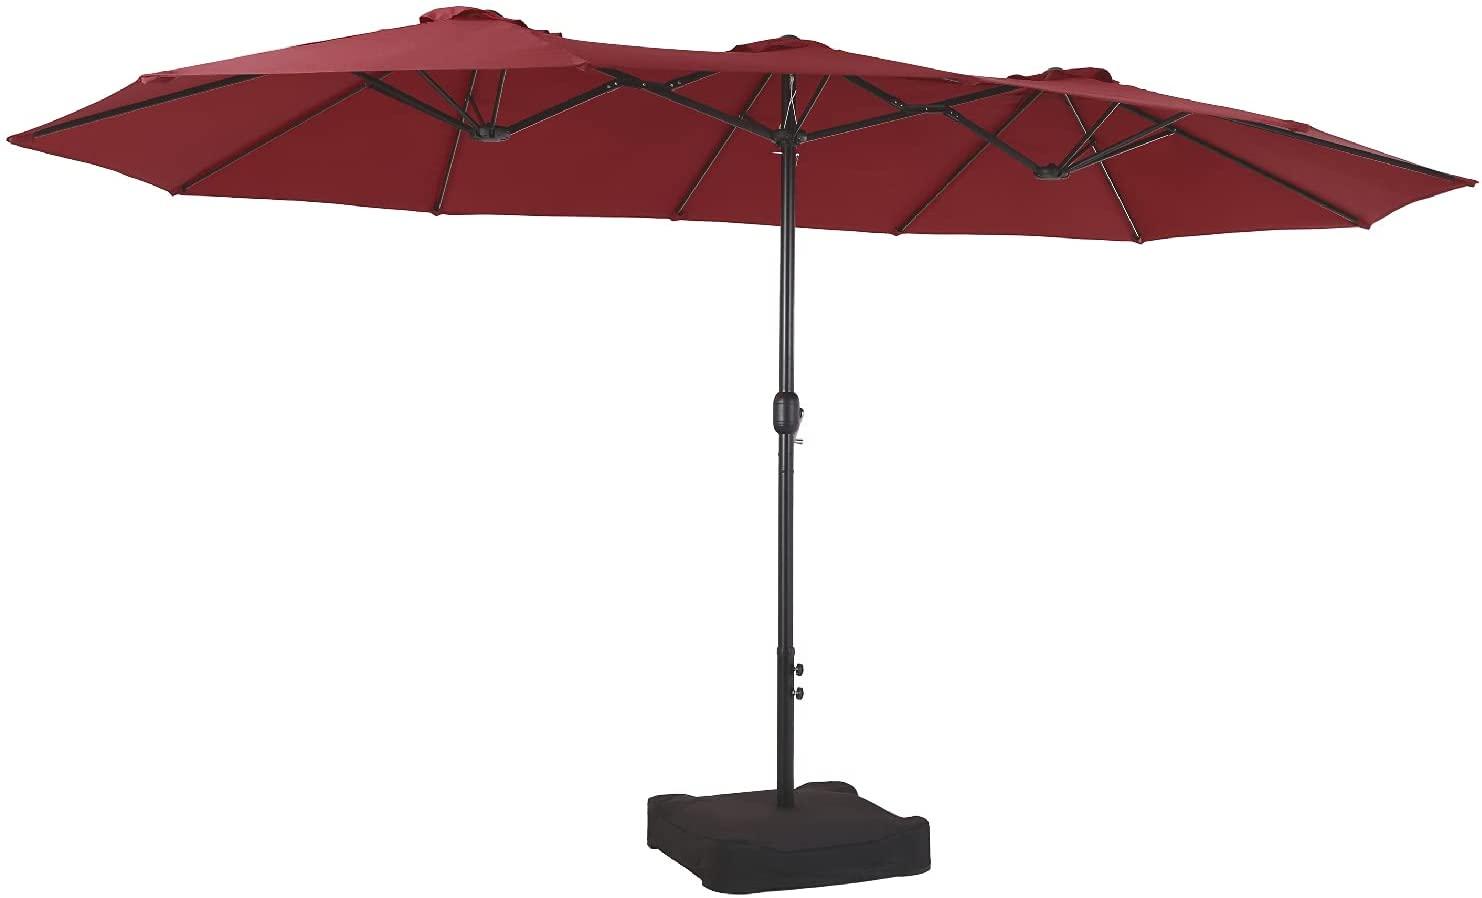 PHI VILLA Double-Sided Patio Umbrella